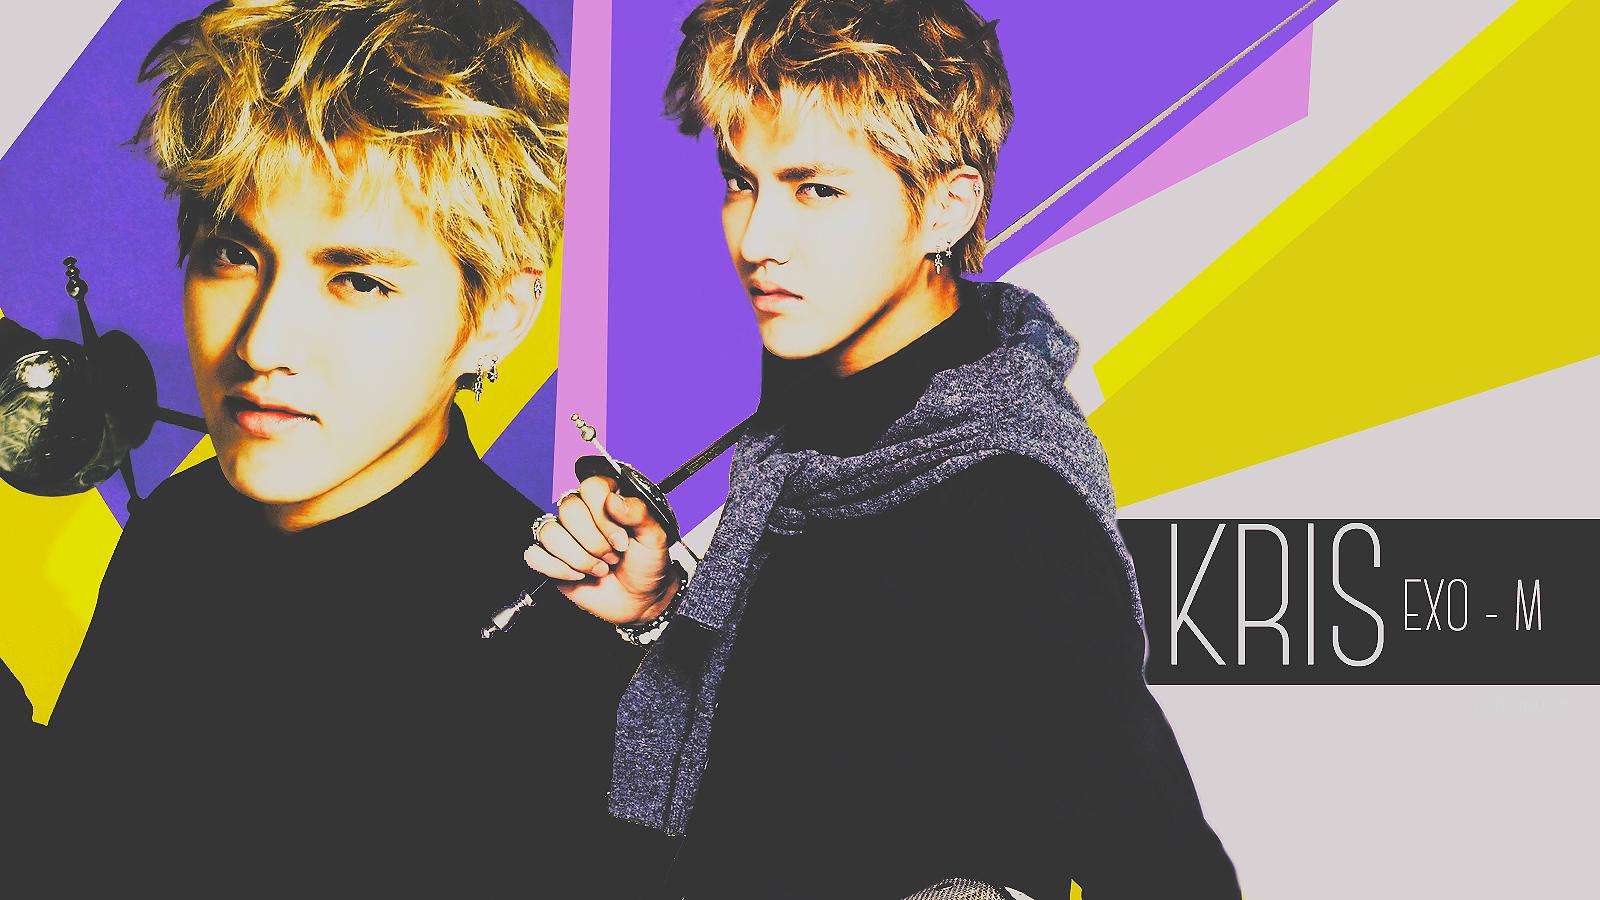 prince exo wallpaper - photo #7